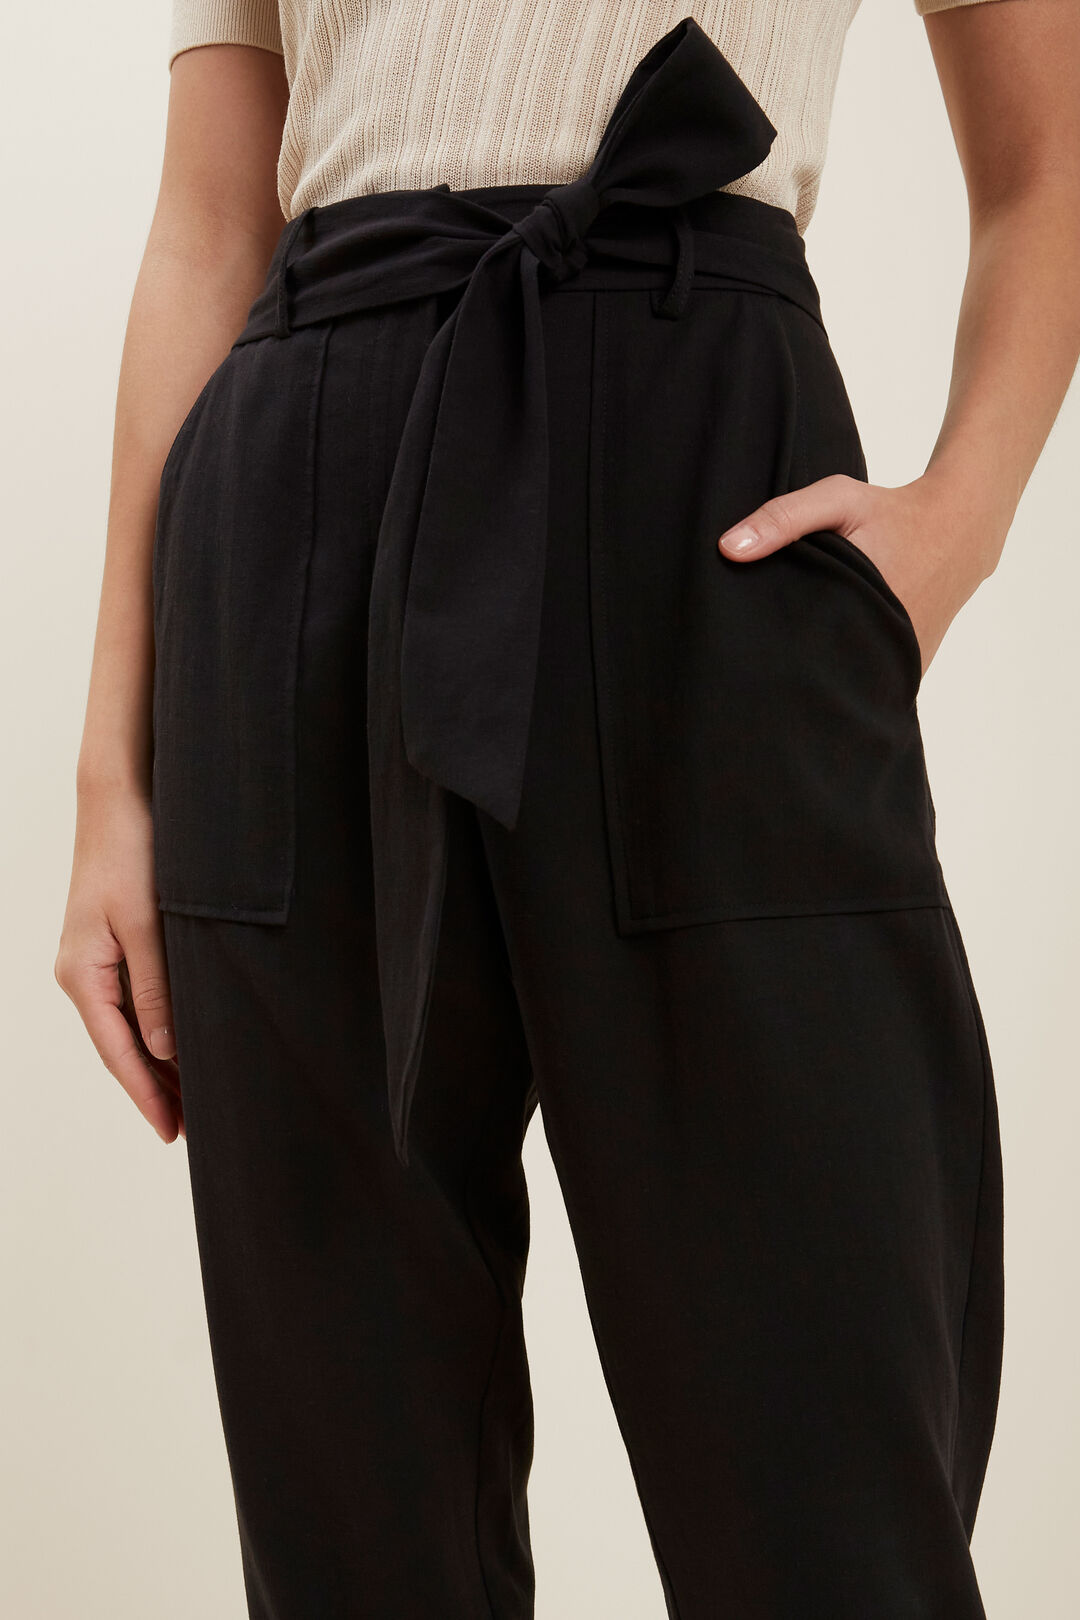 Tie Up Tapered Pant  BLACK  hi-res